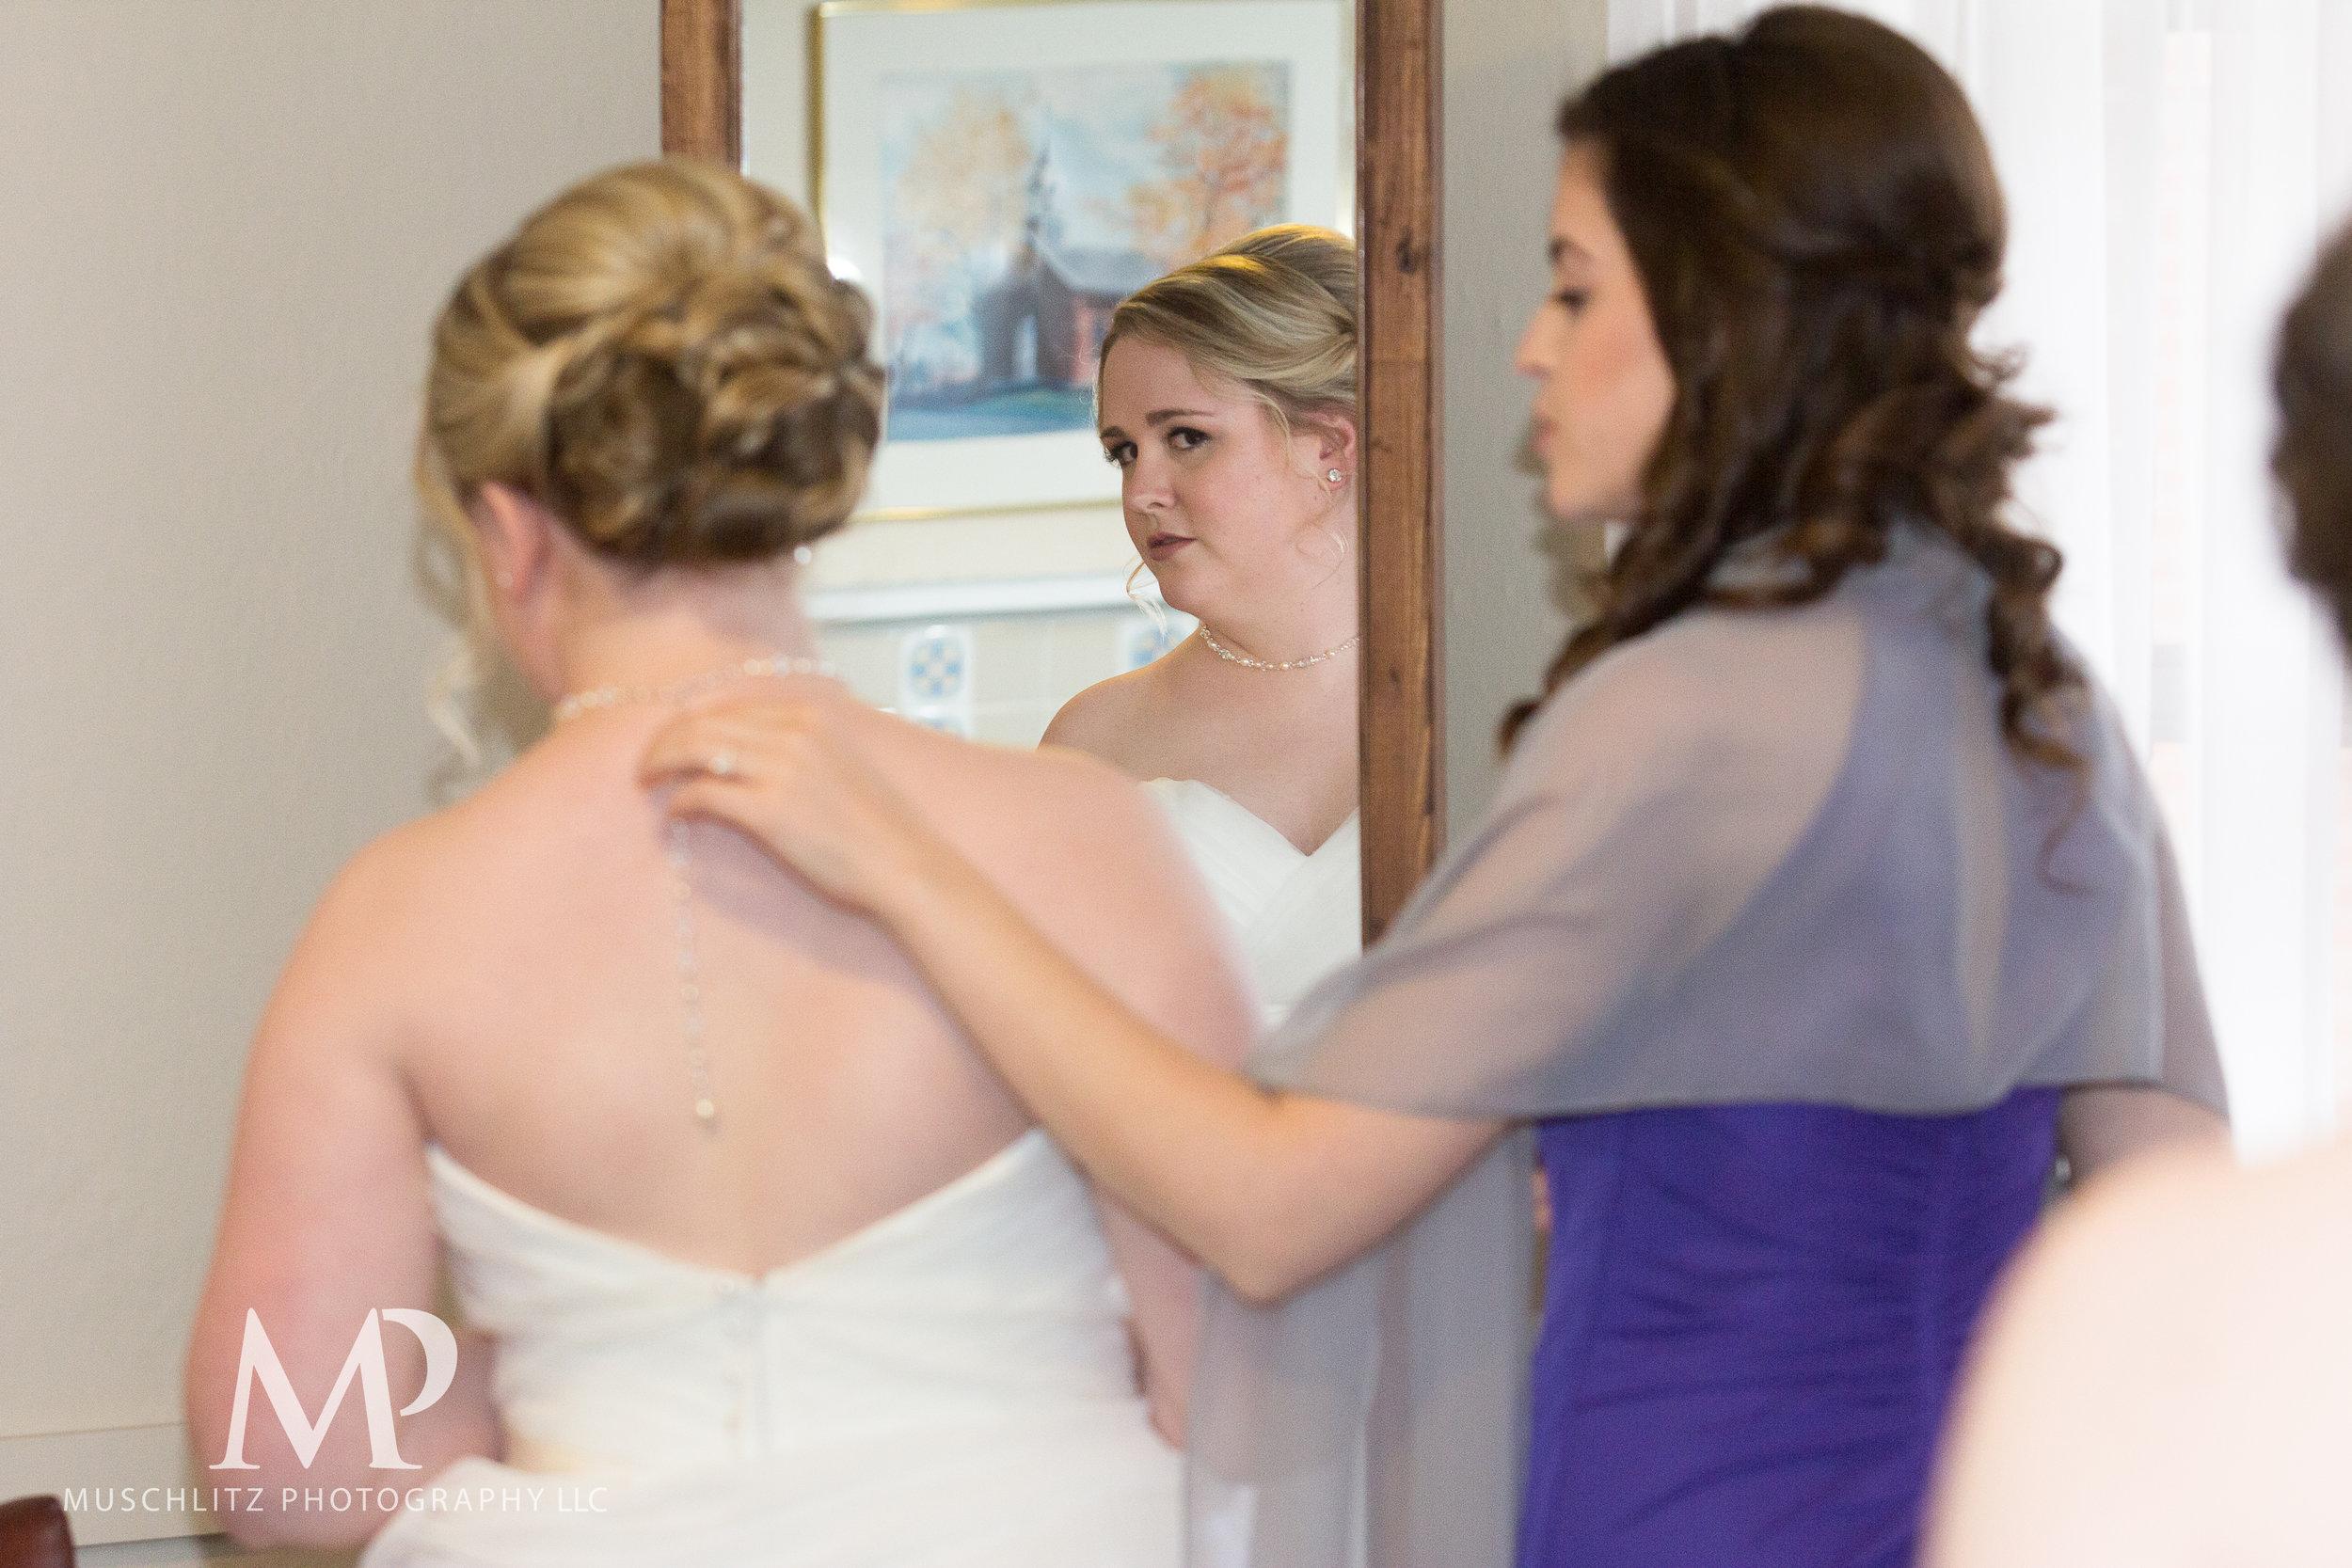 dublin-community-church-wedding-columbus-ohio-muschlitz-photography-025.JPG